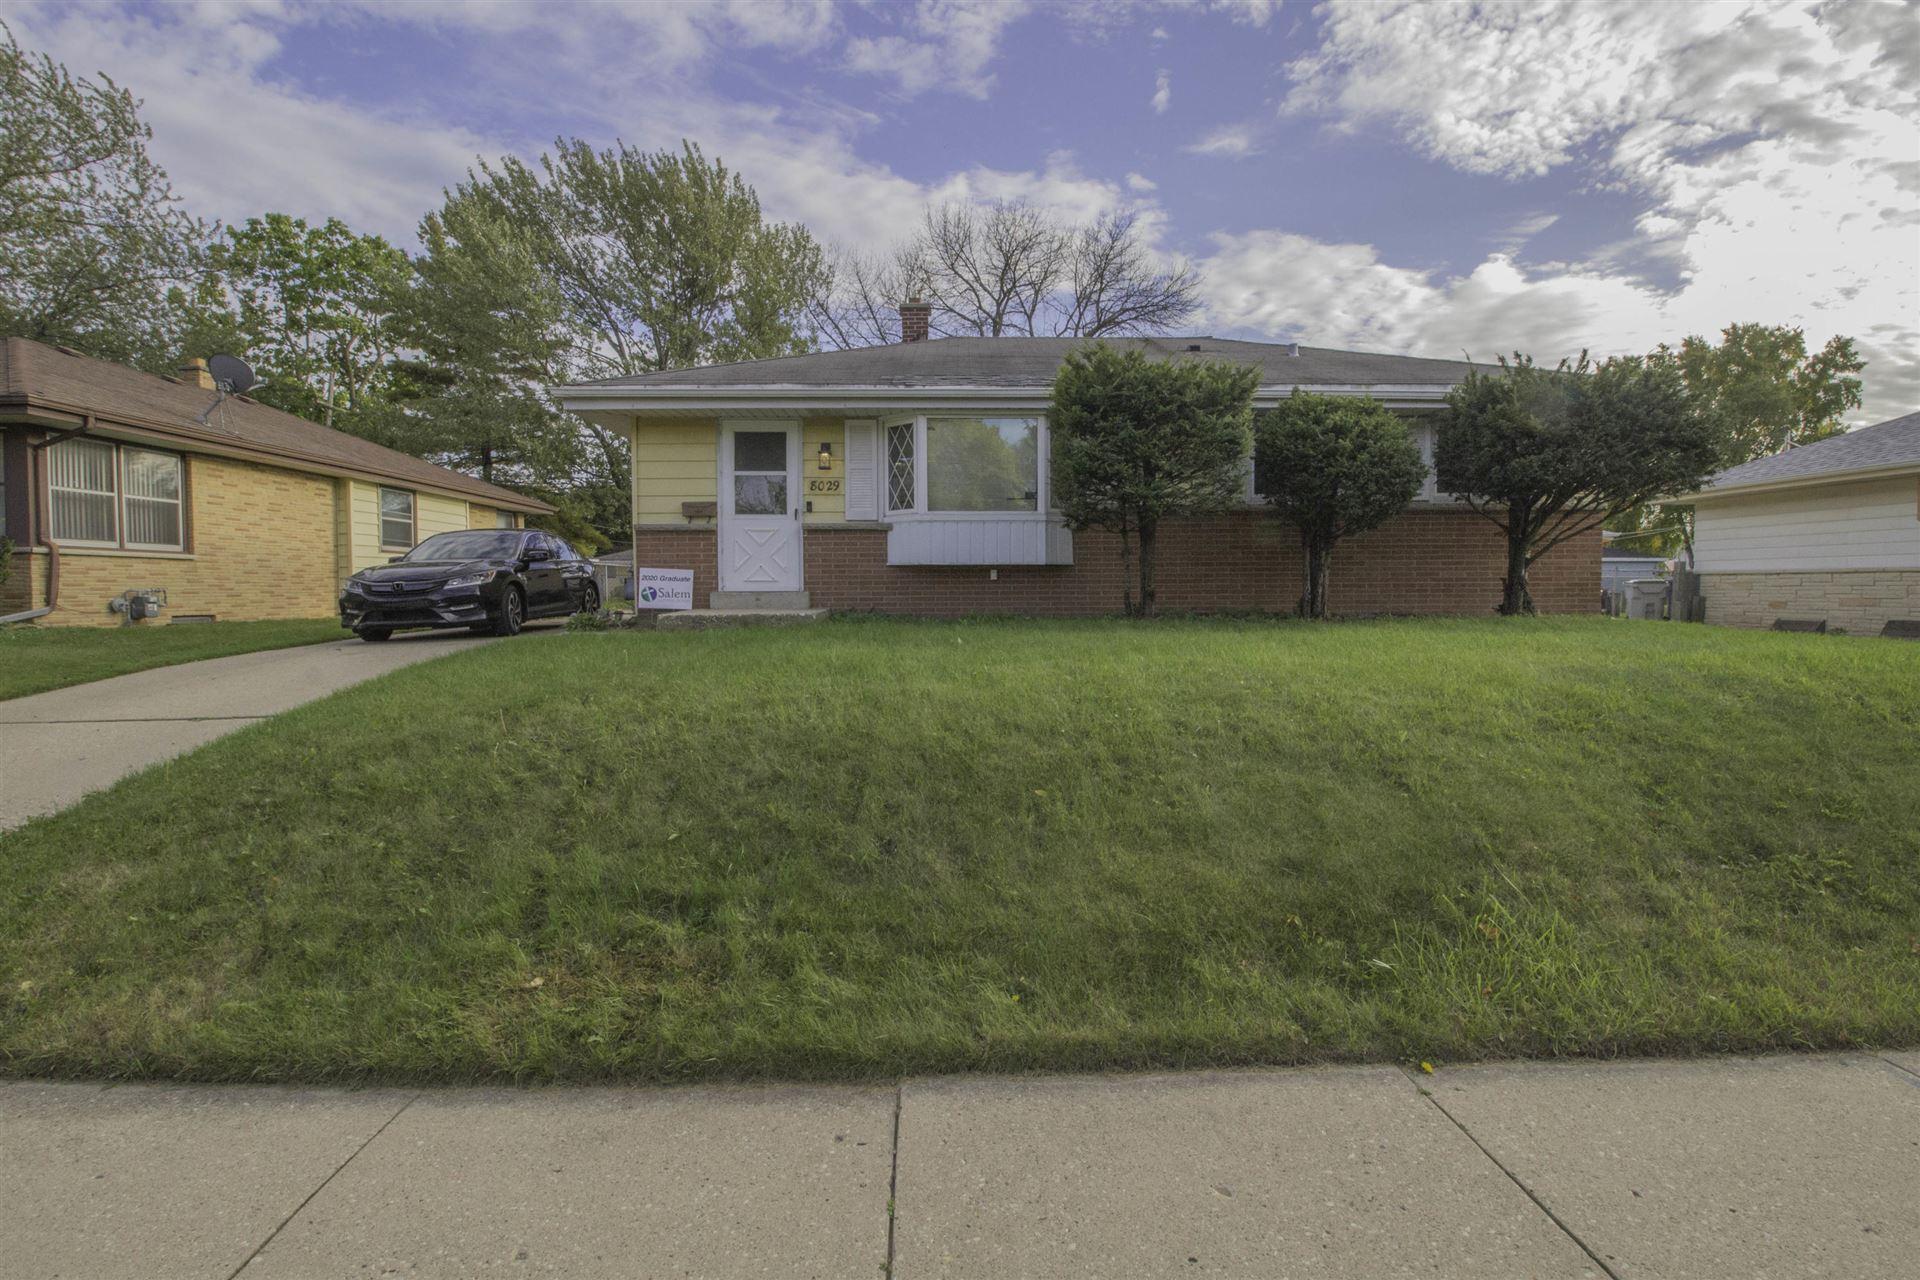 8029 W Green Tree Rd, Milwaukee, WI 53223 - #: 1713720